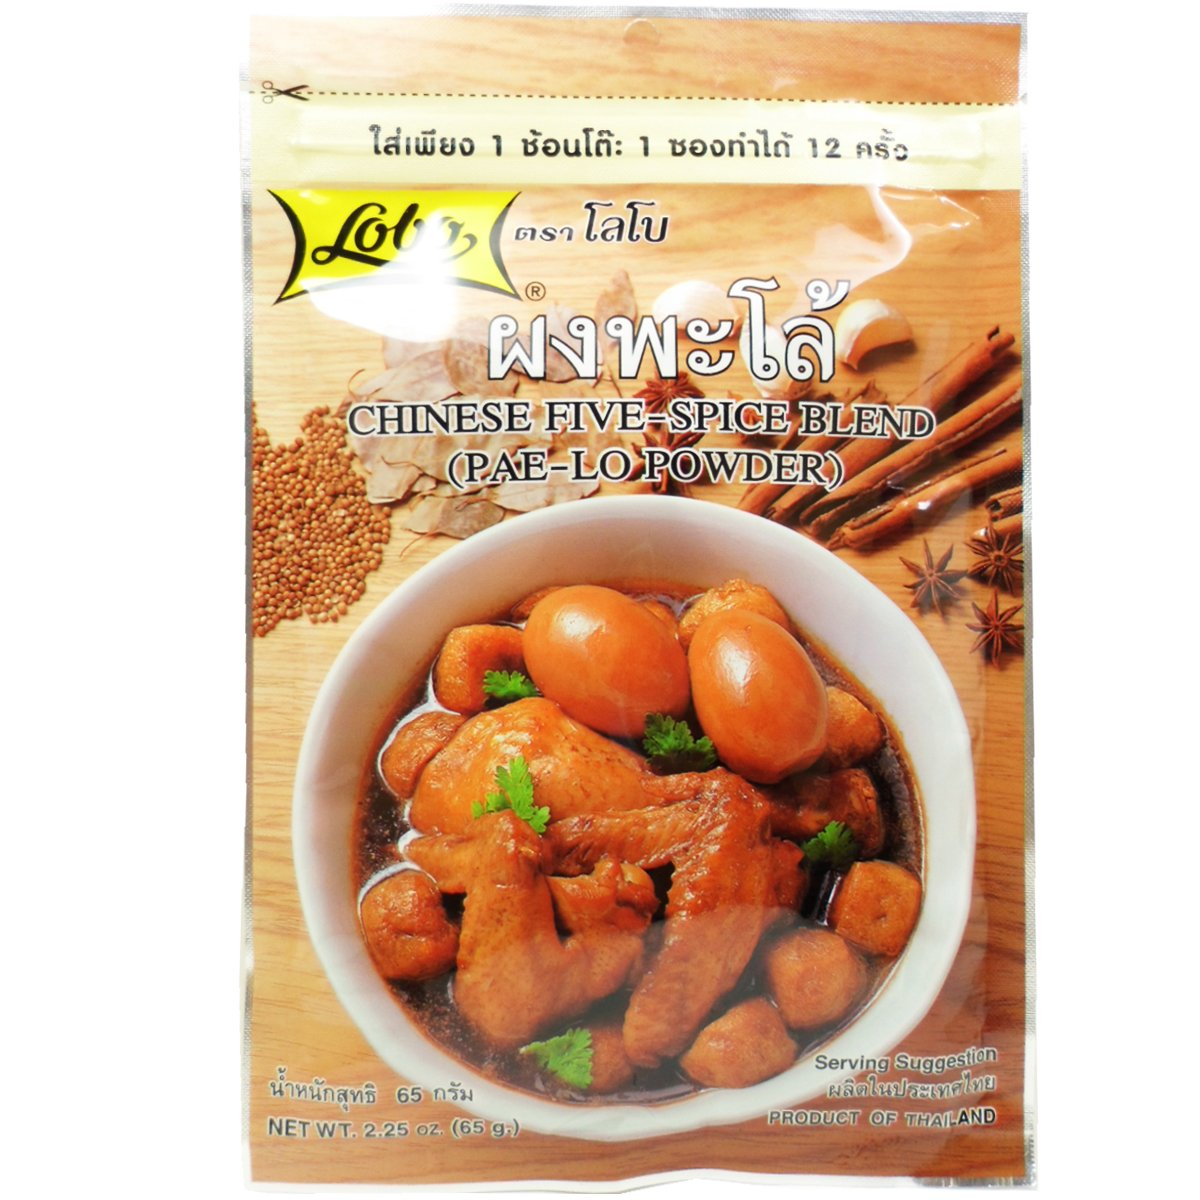 Chinese Five Spice Blend (Pae-lo Powder) Net Wt 65g (2.25 Oz) Thai Herbal Food X 2 Bags